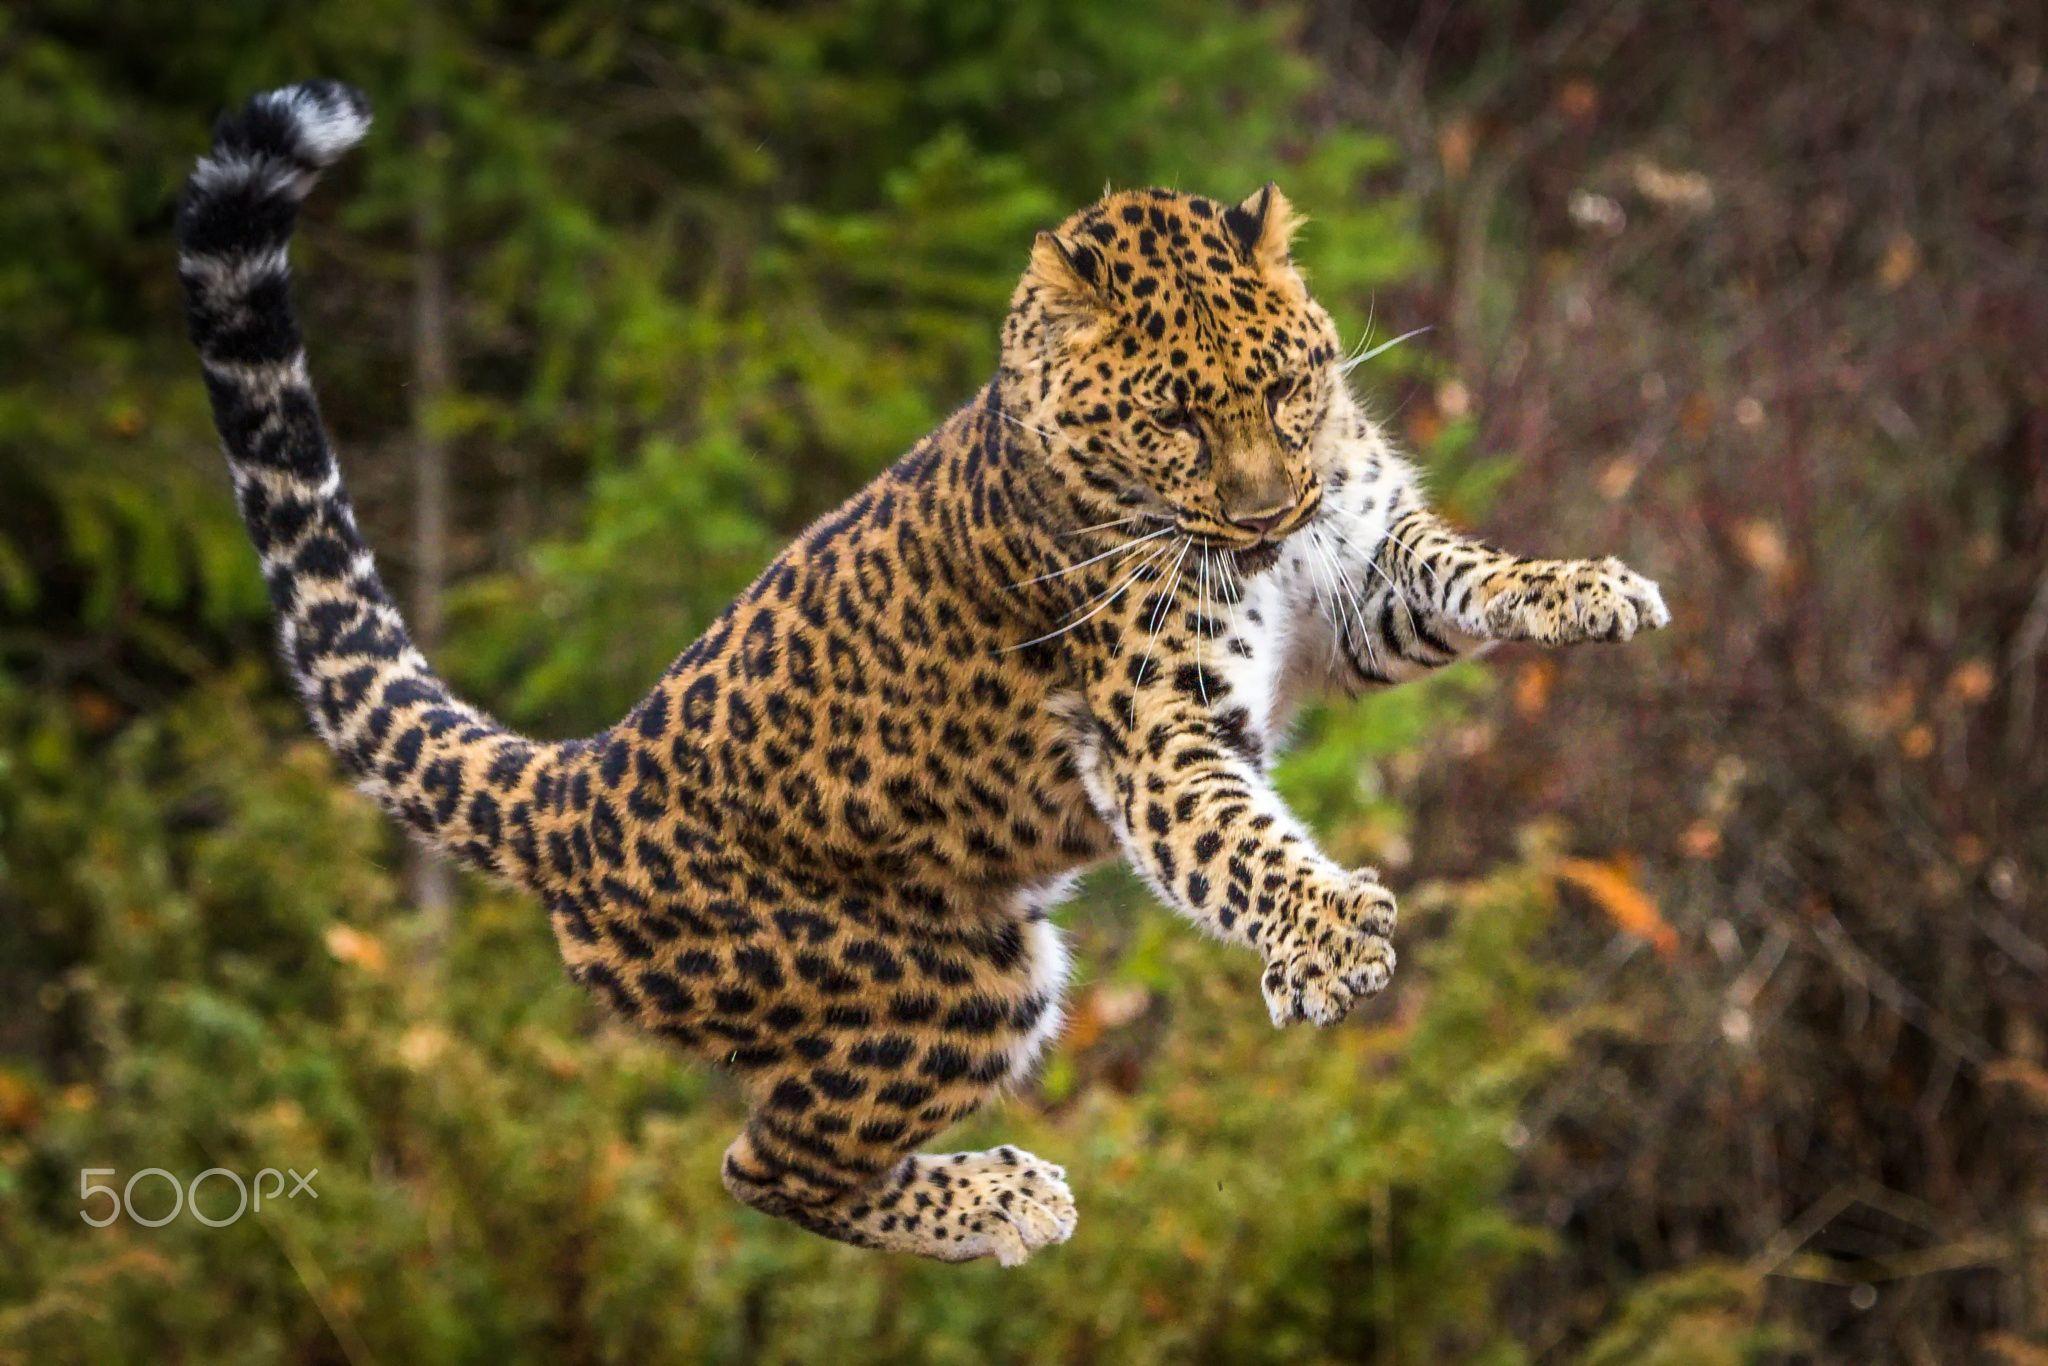 Amur Leopard Falling After Jump At Prey